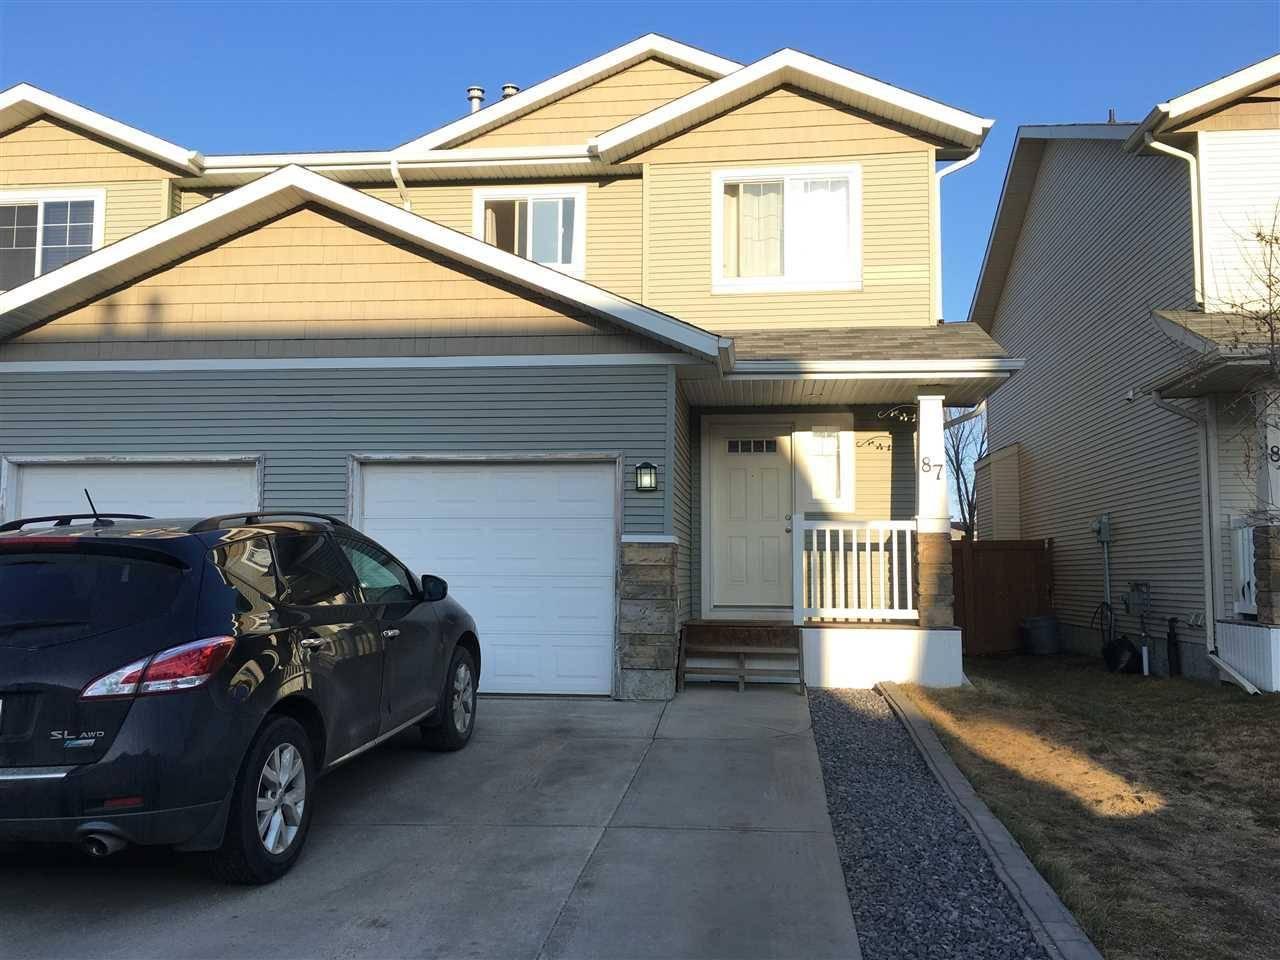 Townhouse for sale at 14208 36 St Nw Unit 87 Edmonton Alberta - MLS: E4177158